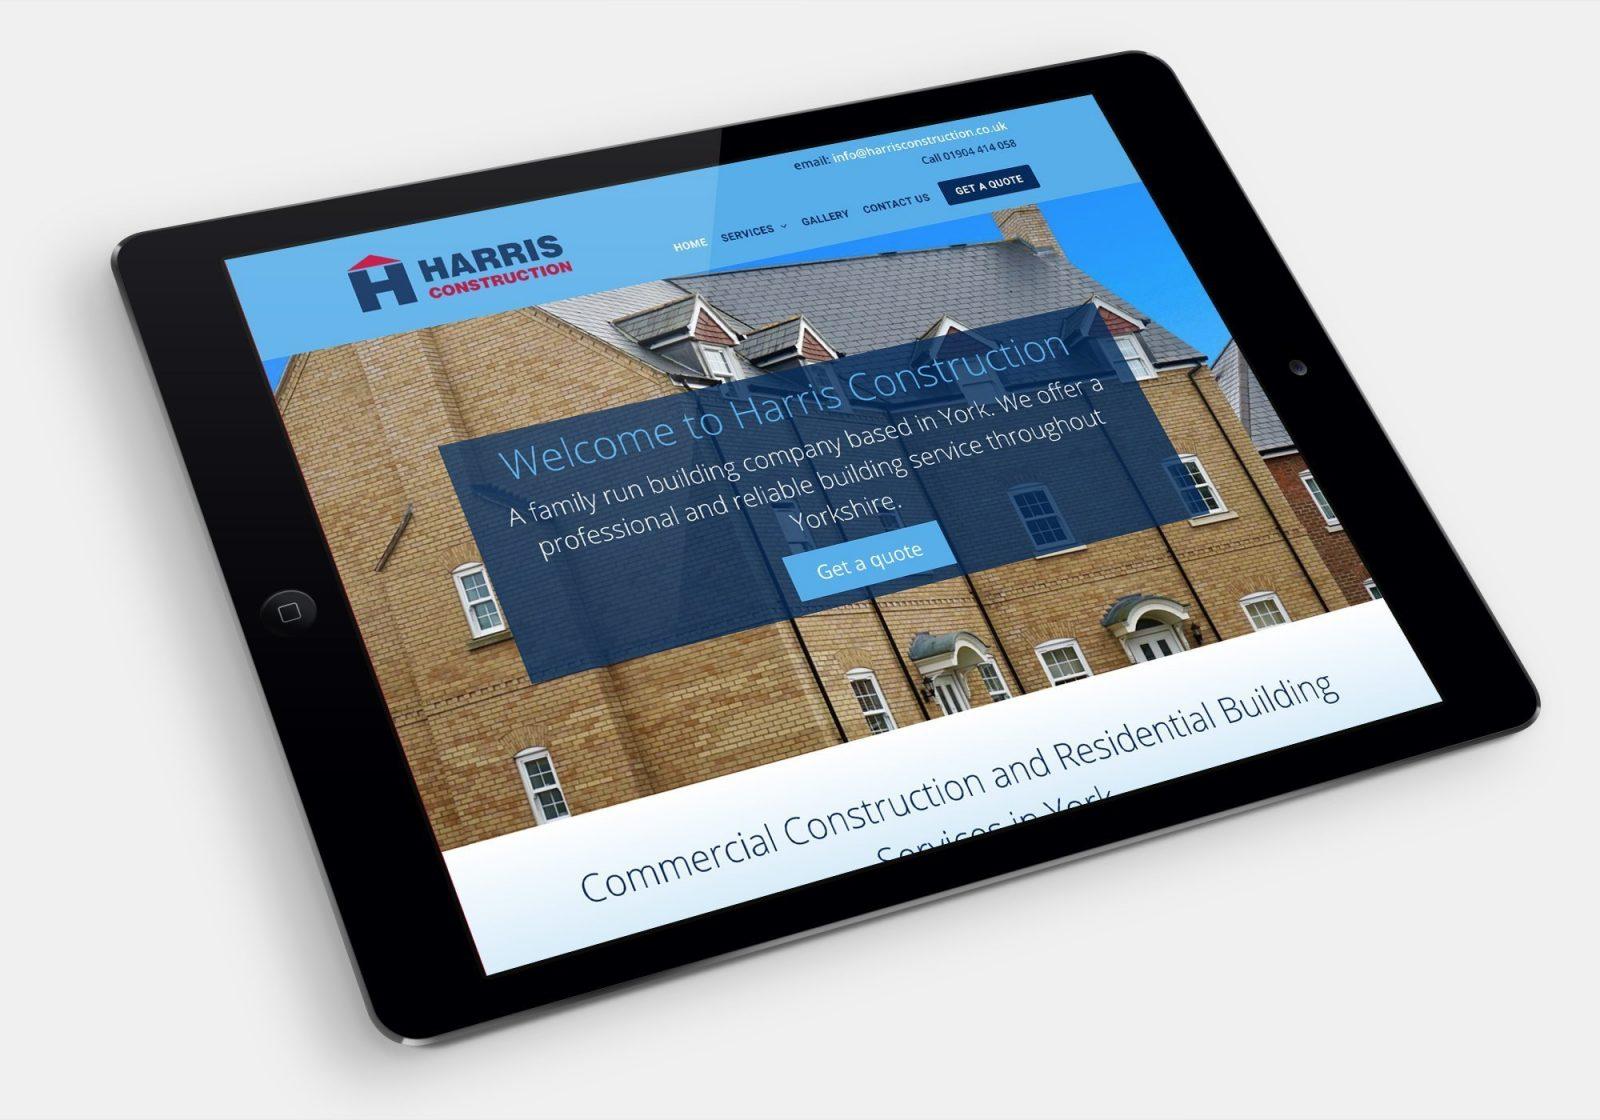 Harris Construction website shown on an ipad